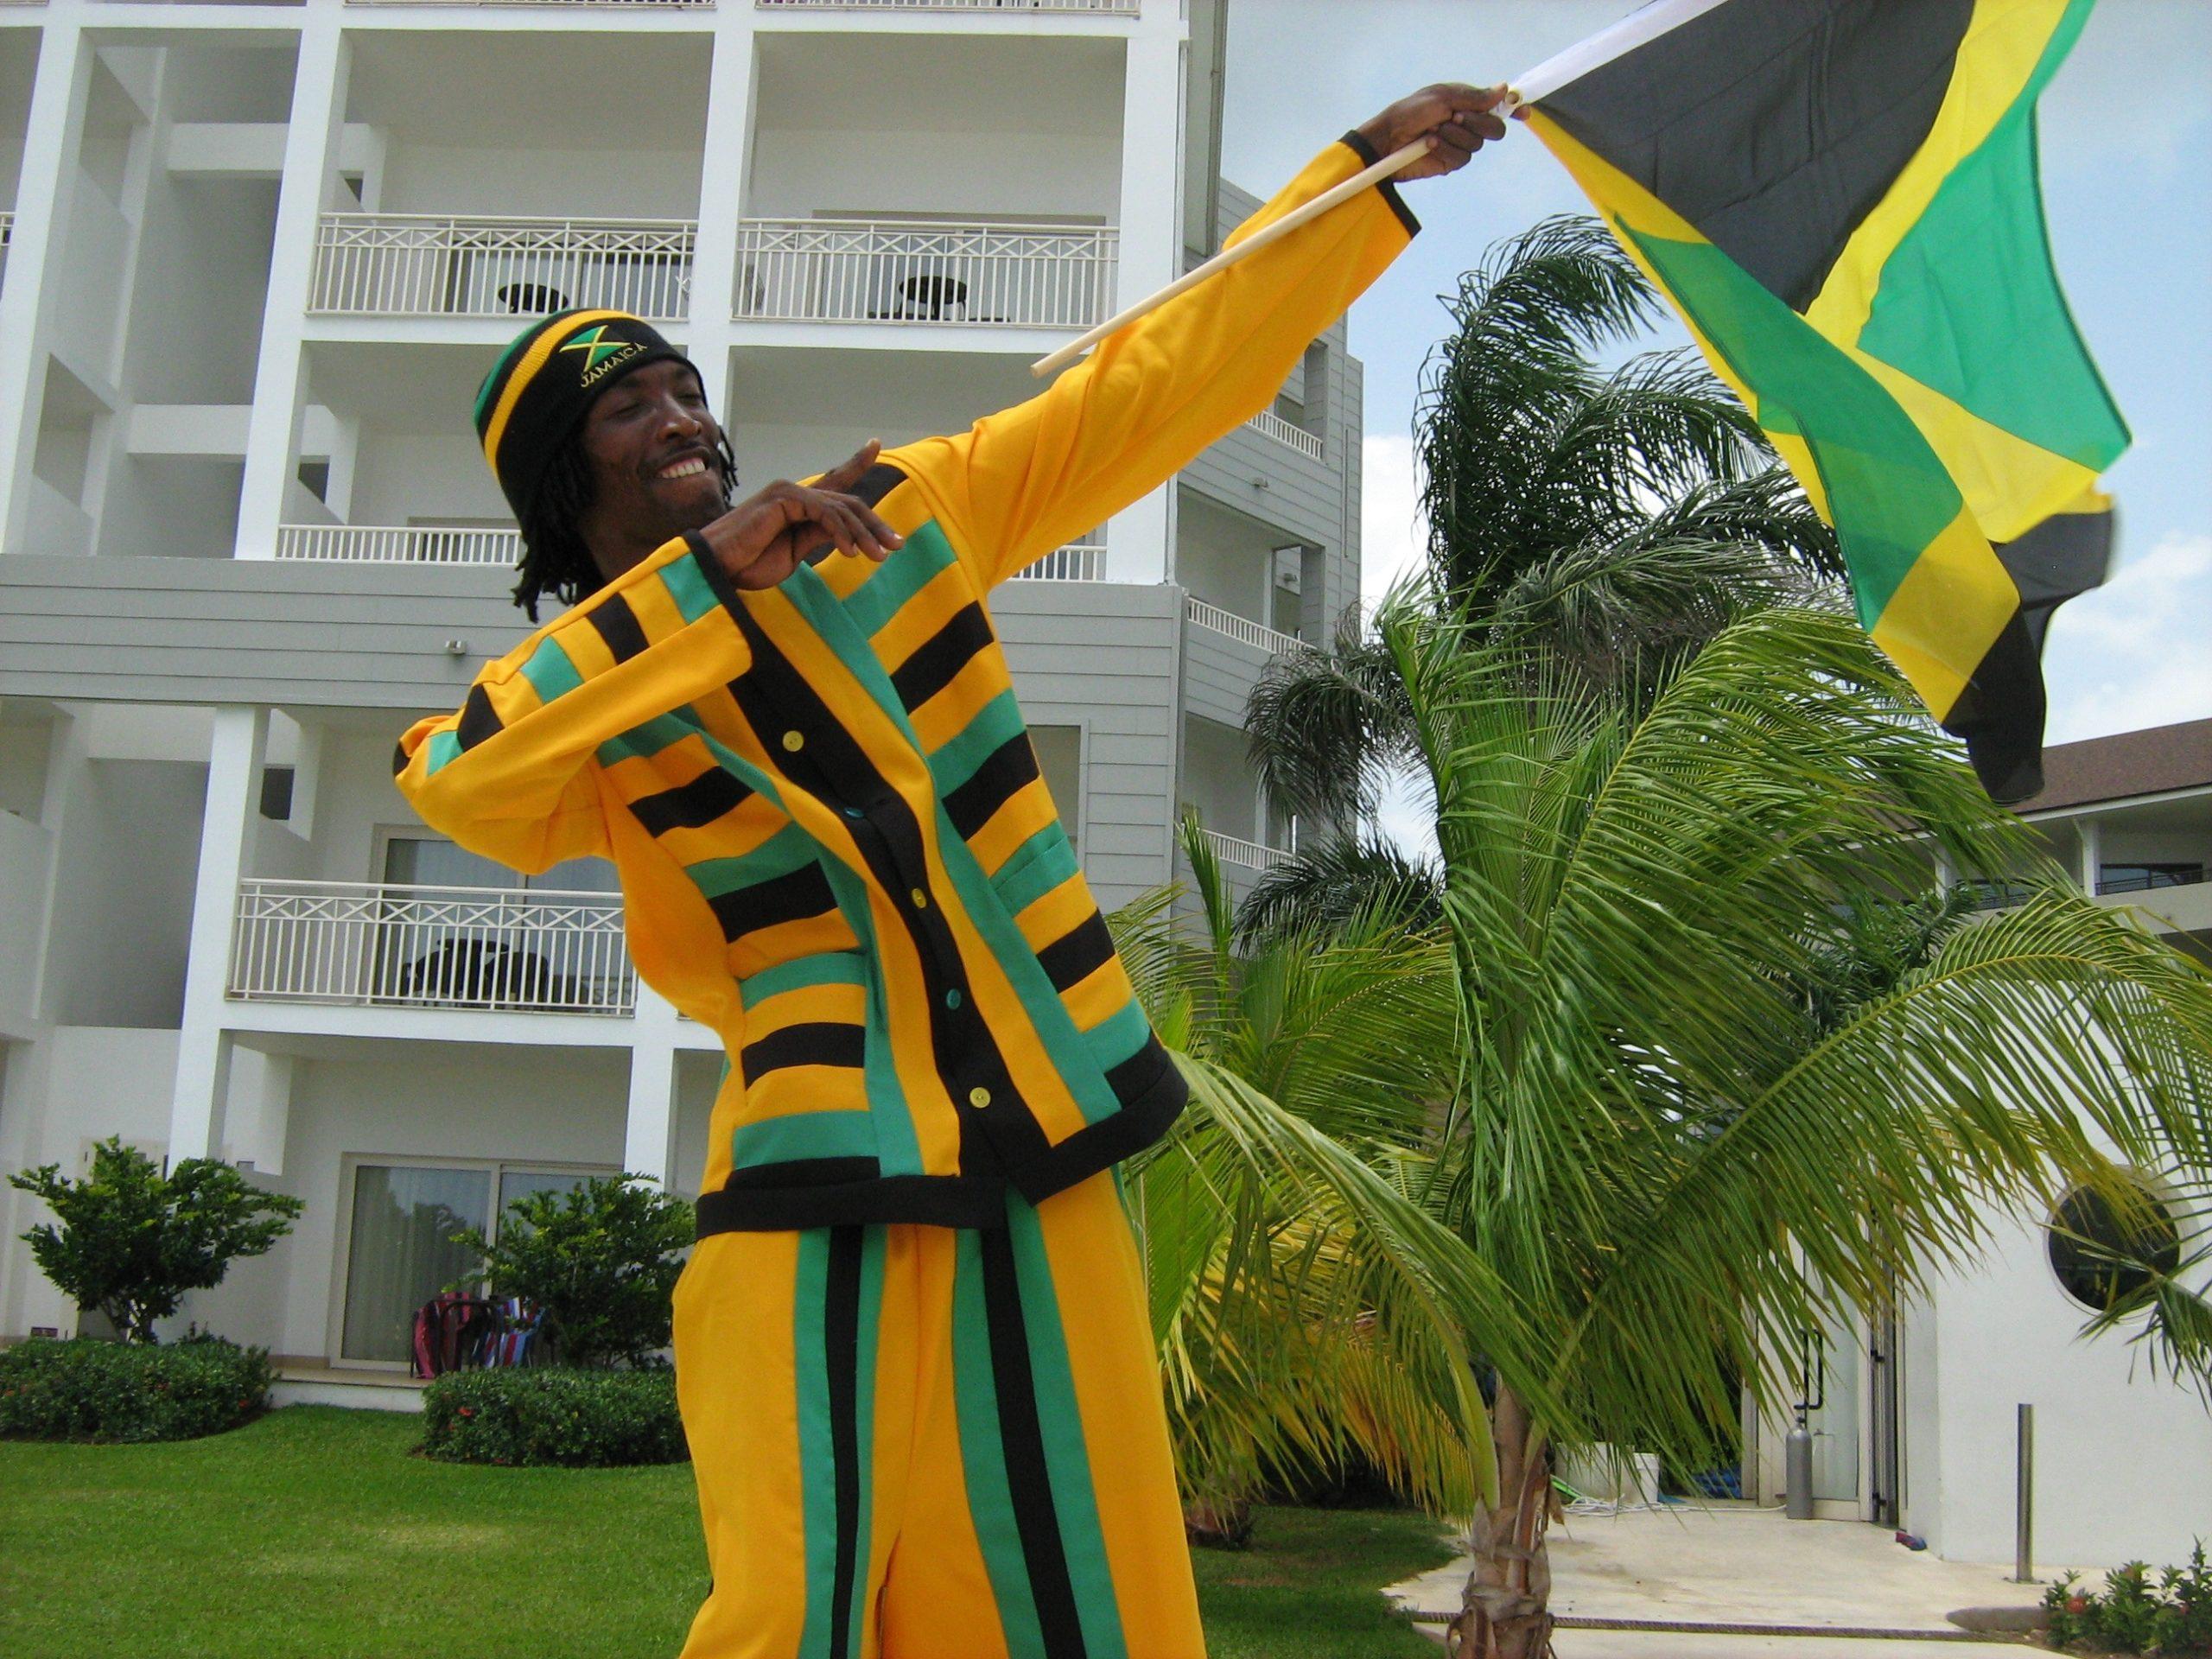 people-country-travel-celebration-statue-symbol-flag-celebrate-patriotism-national-patriot-jamaica-history-nation-independence-patriotic-pride-waving-896305